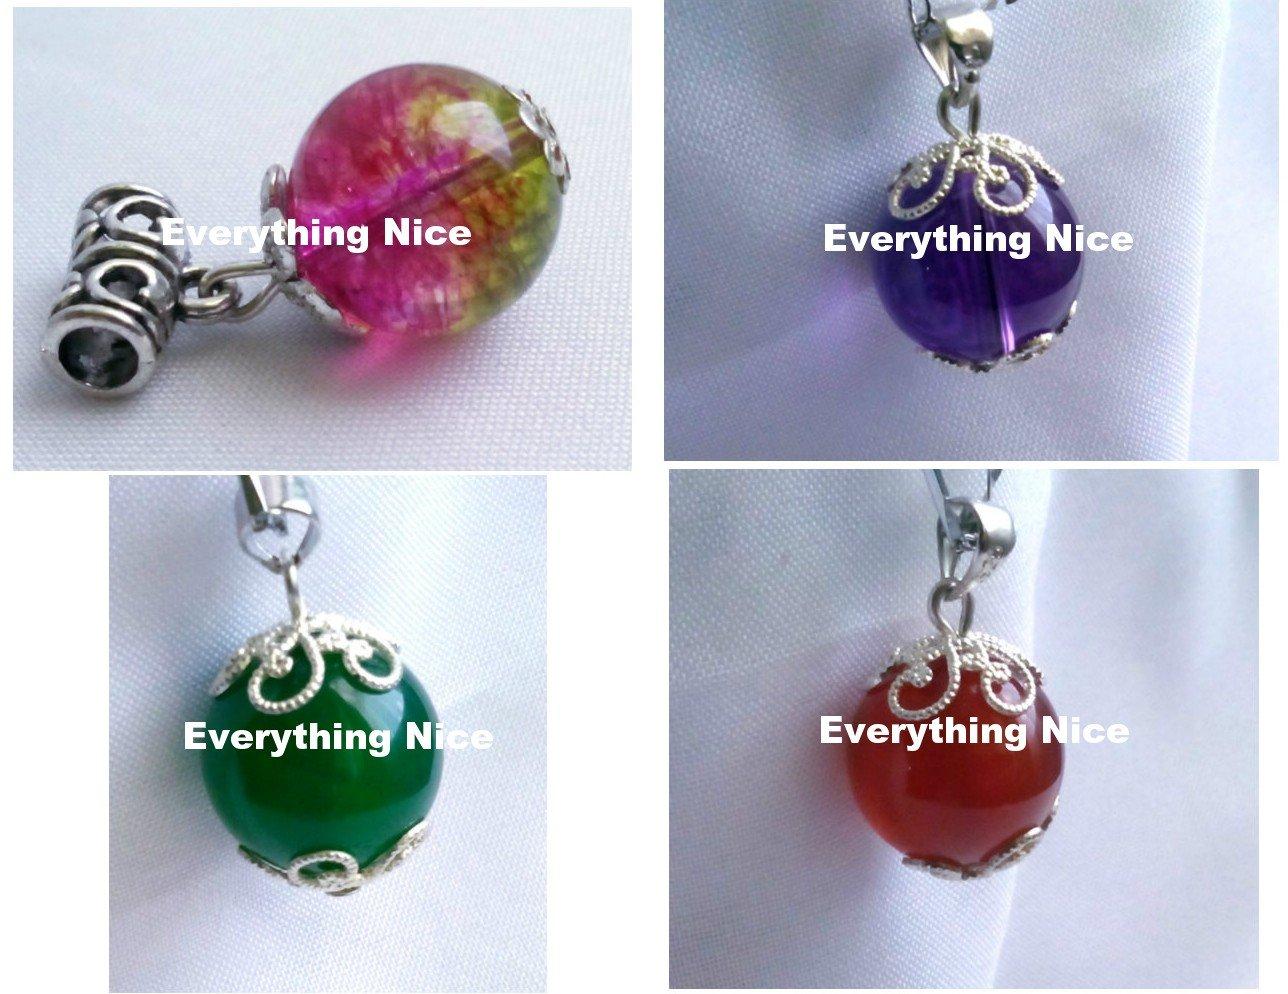 Set of 4 pcs agate pendants charms for necklaces or bracelets